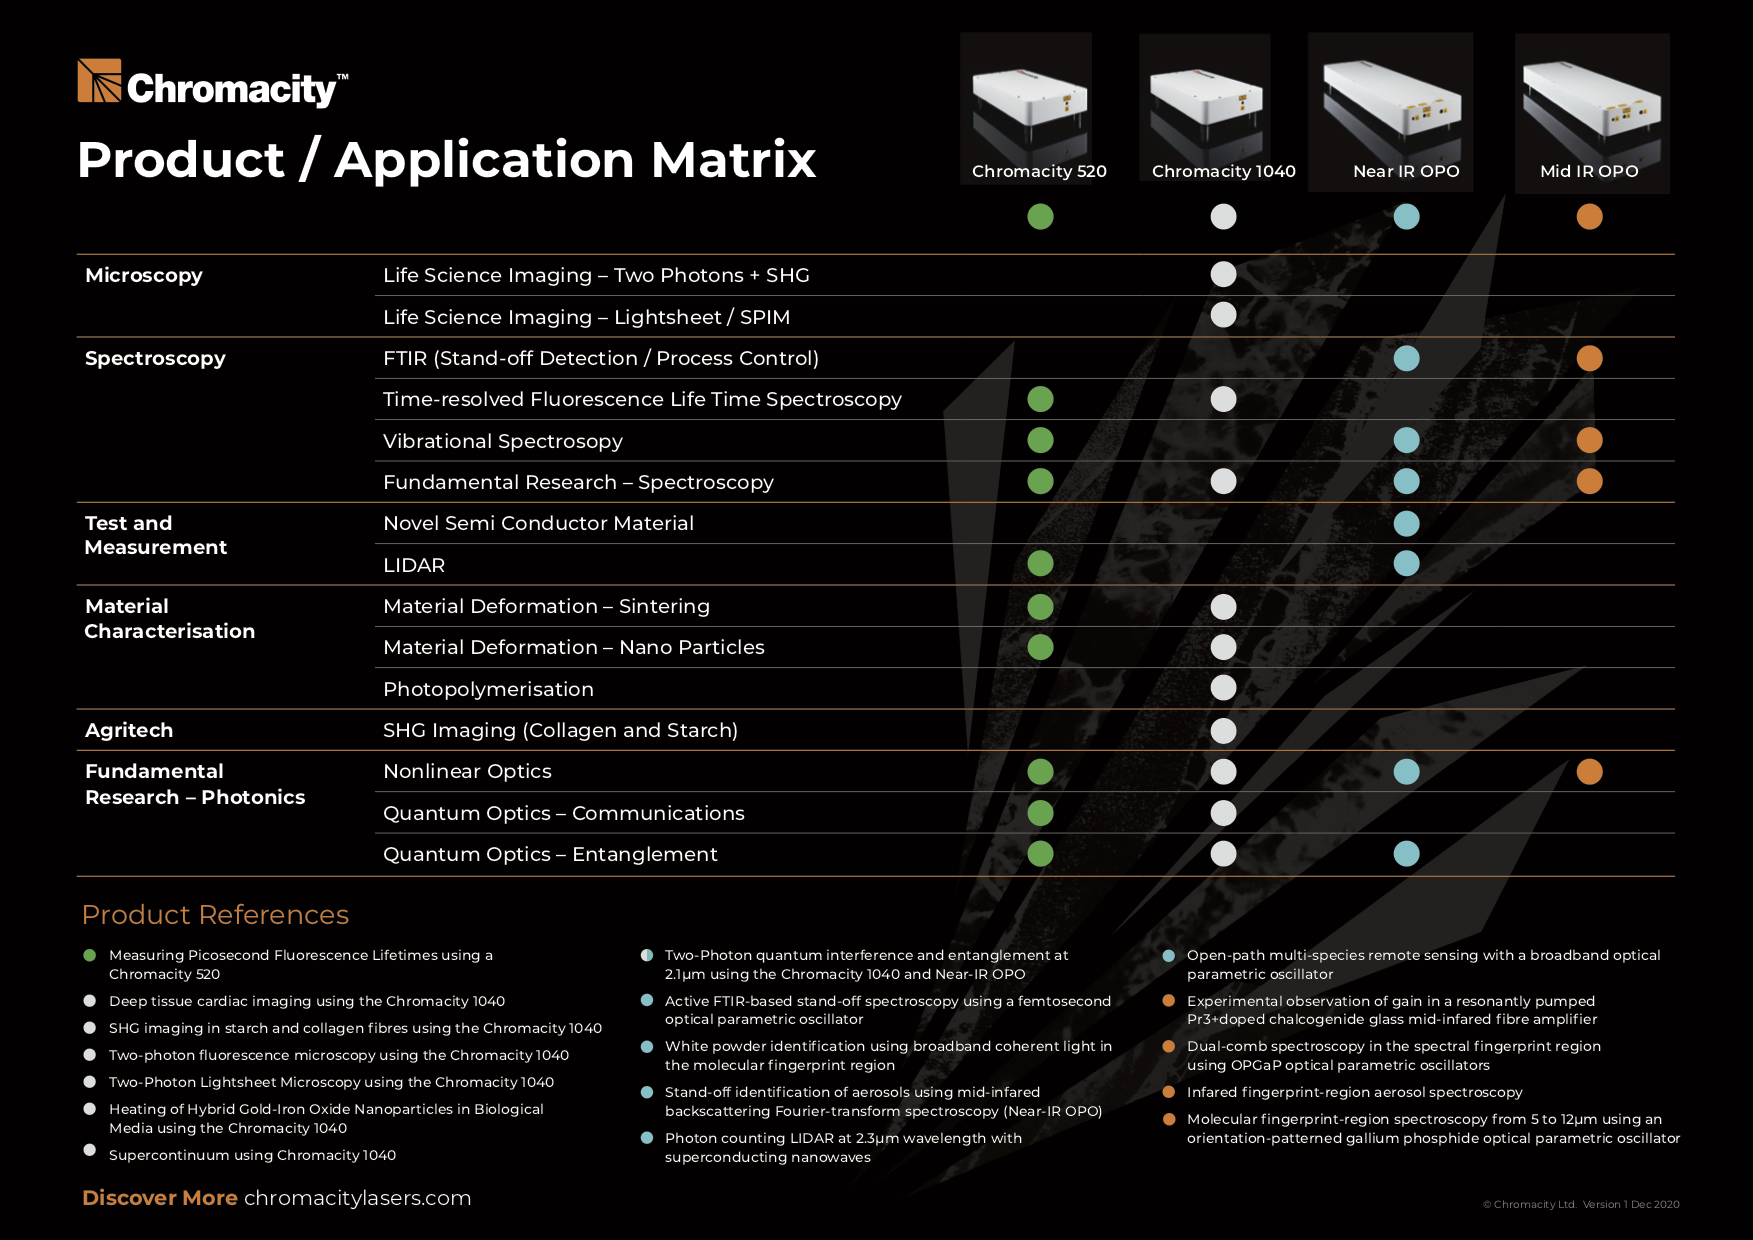 Chromacity_Product_Application_Matrix.jpg